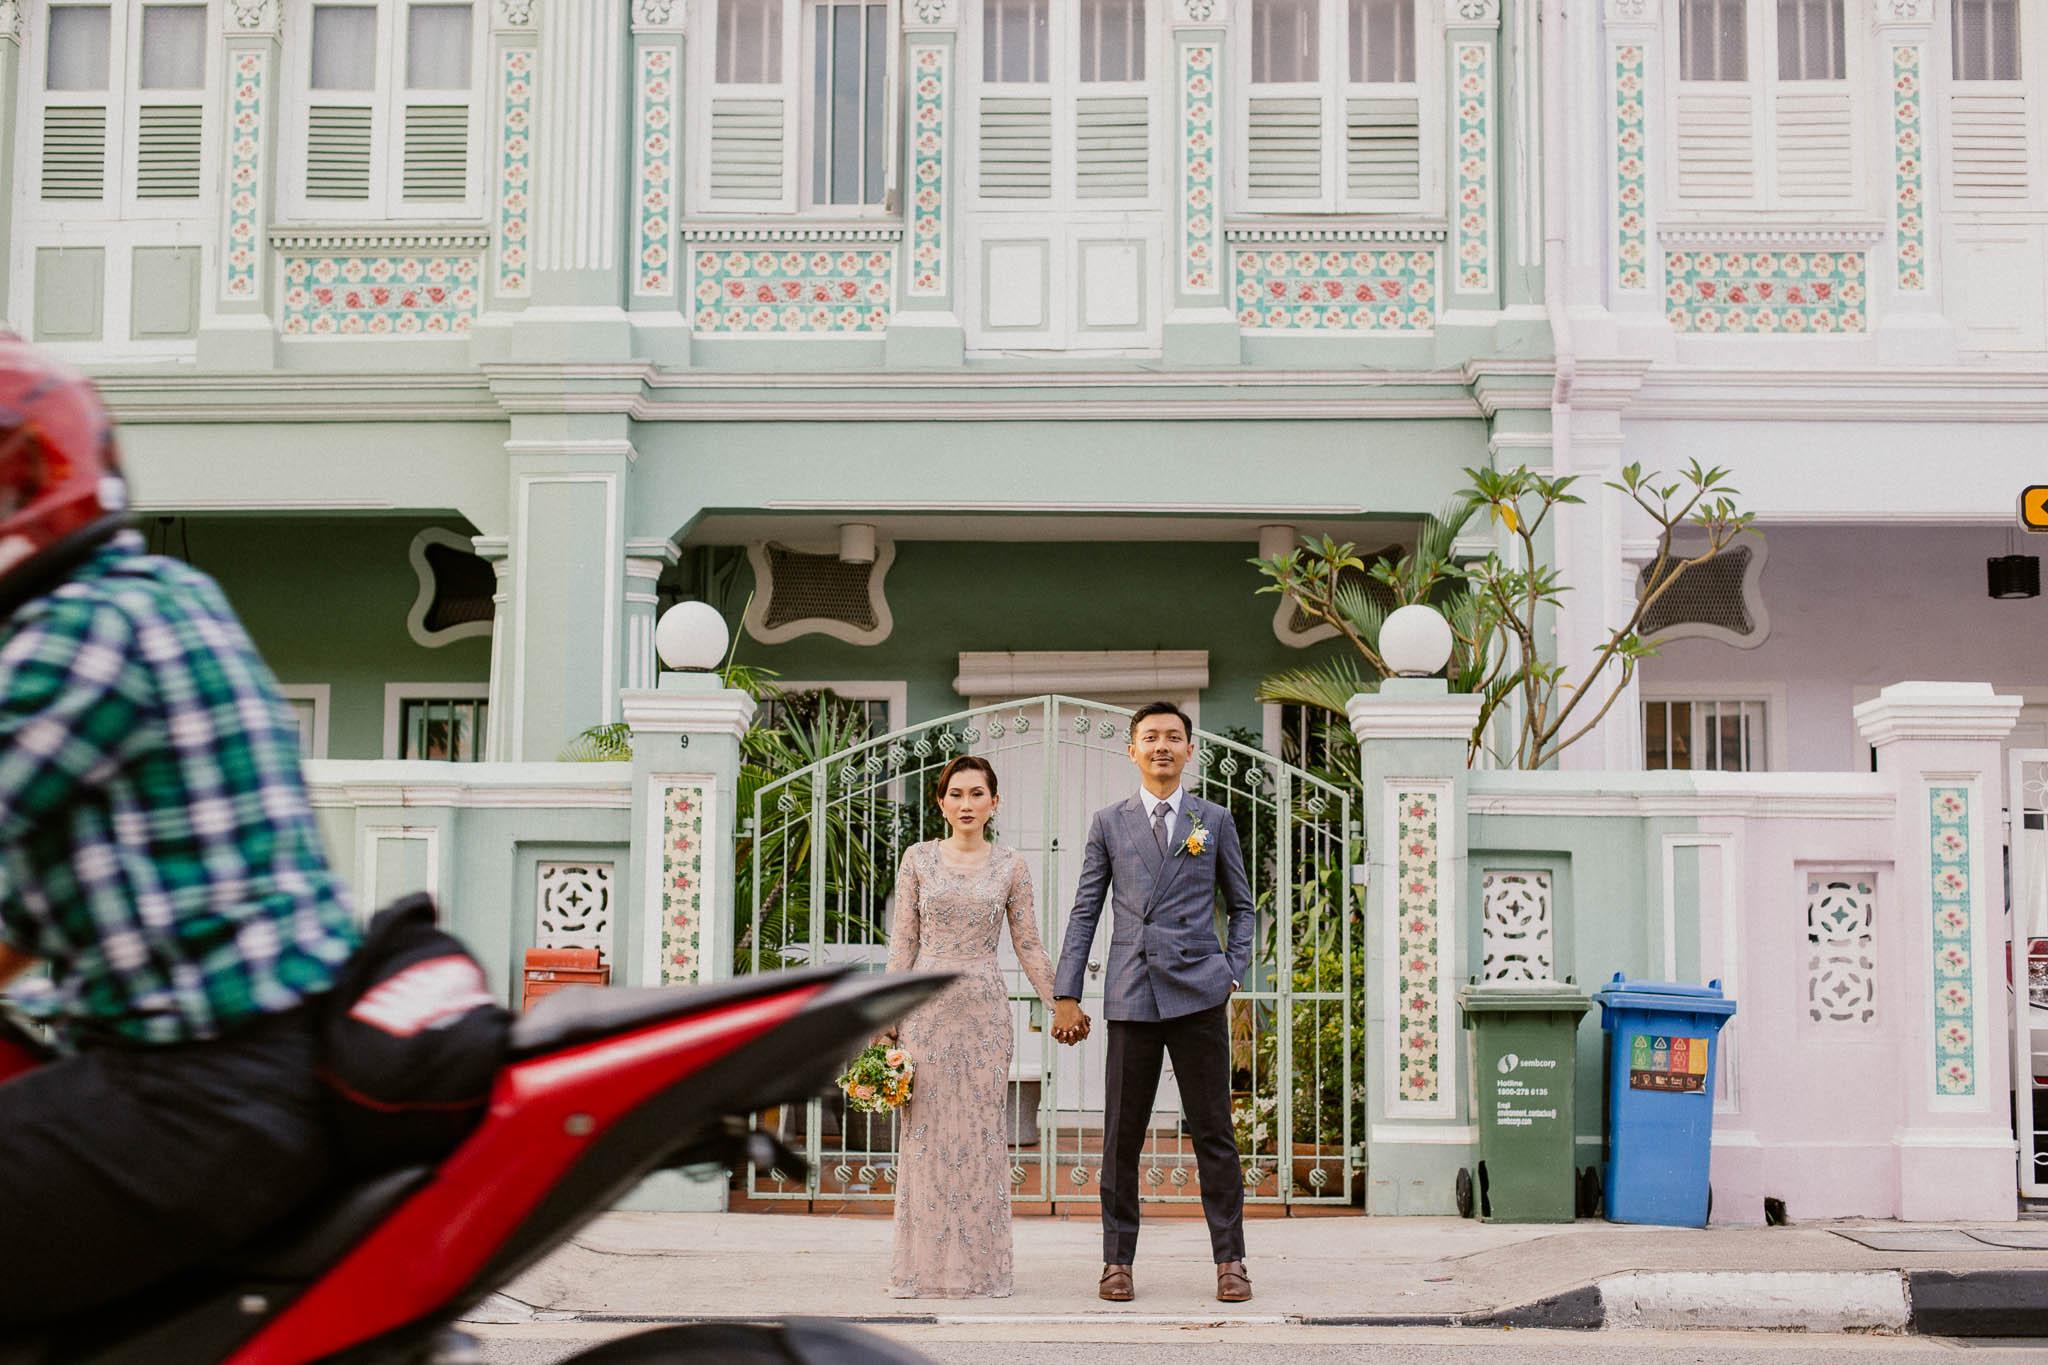 singapore-wedding-photographer-wedding-nufail-addafiq-079.jpg